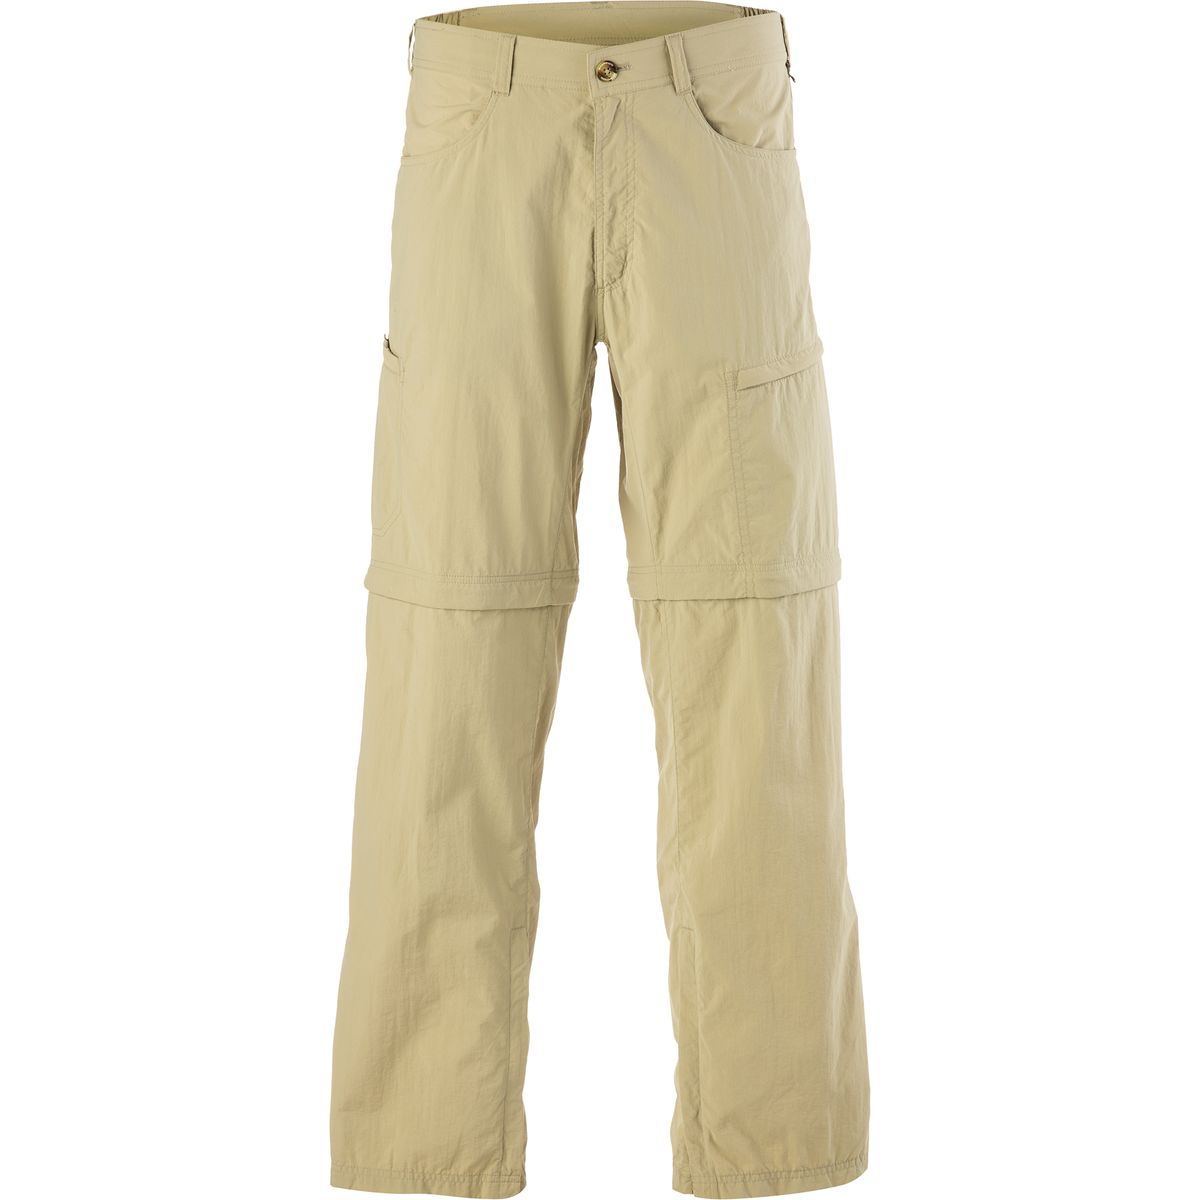 photo: ExOfficio Men's BugsAway Ziwa Convertible Pant hiking pant